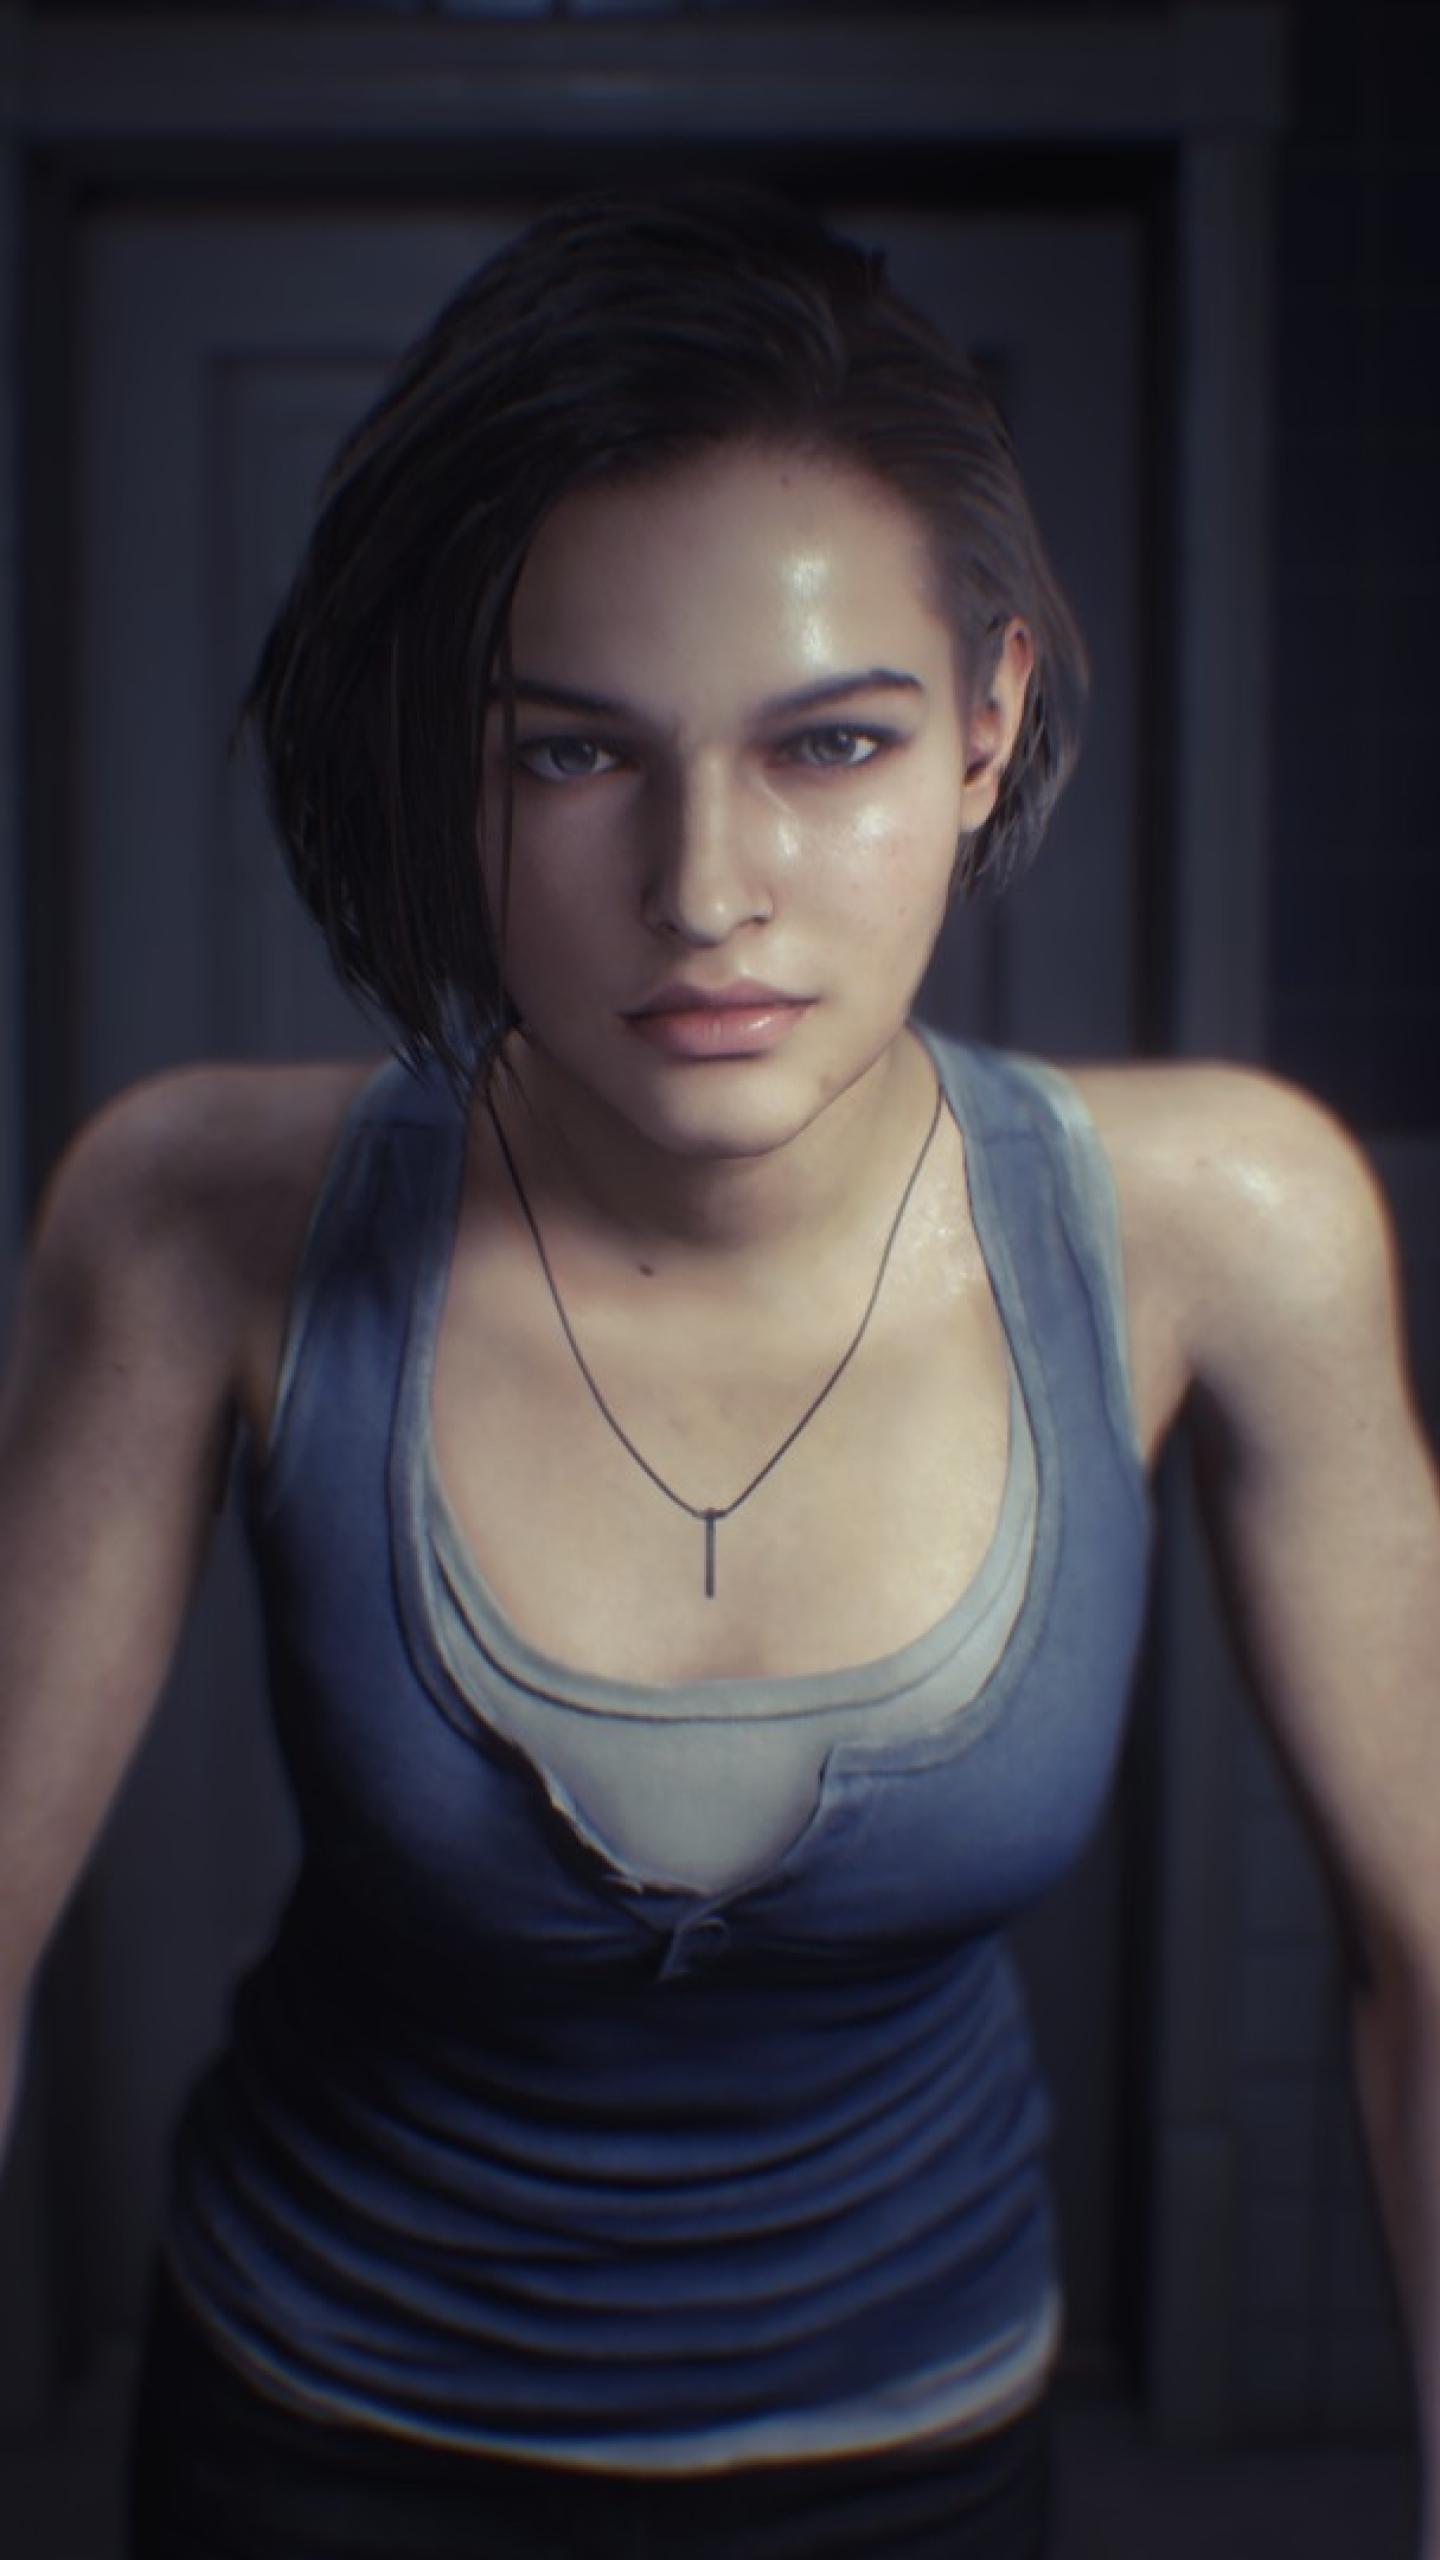 1440x2560 Jill Valentine Resident Evil 3 Remake Samsung Galaxy S6